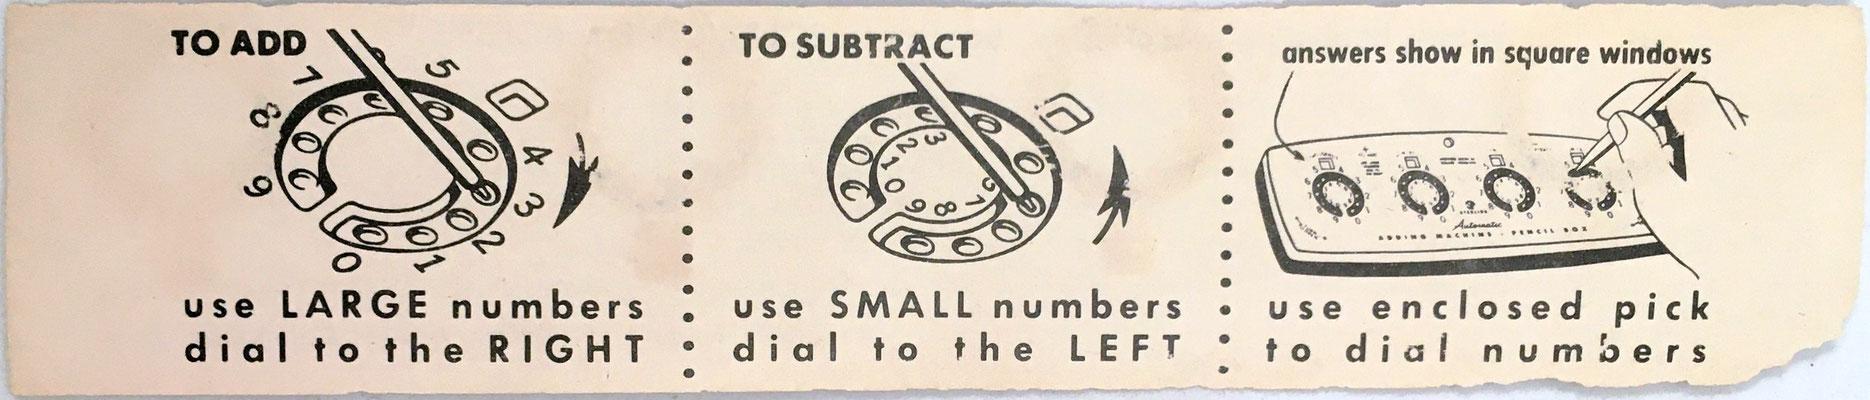 Instrucciones de uso para el DIAL-A-MATIC Adding Machine de la tapa del estuche, anverso